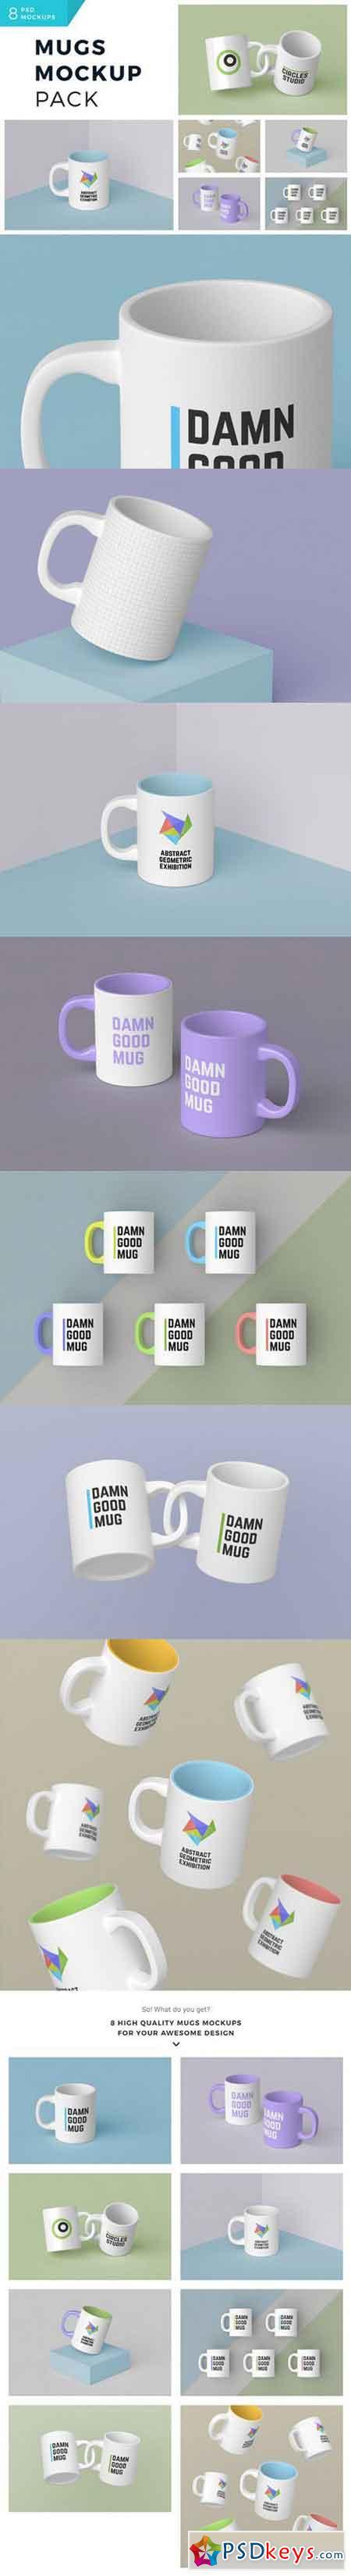 Mugs Mockup Pack 1045701